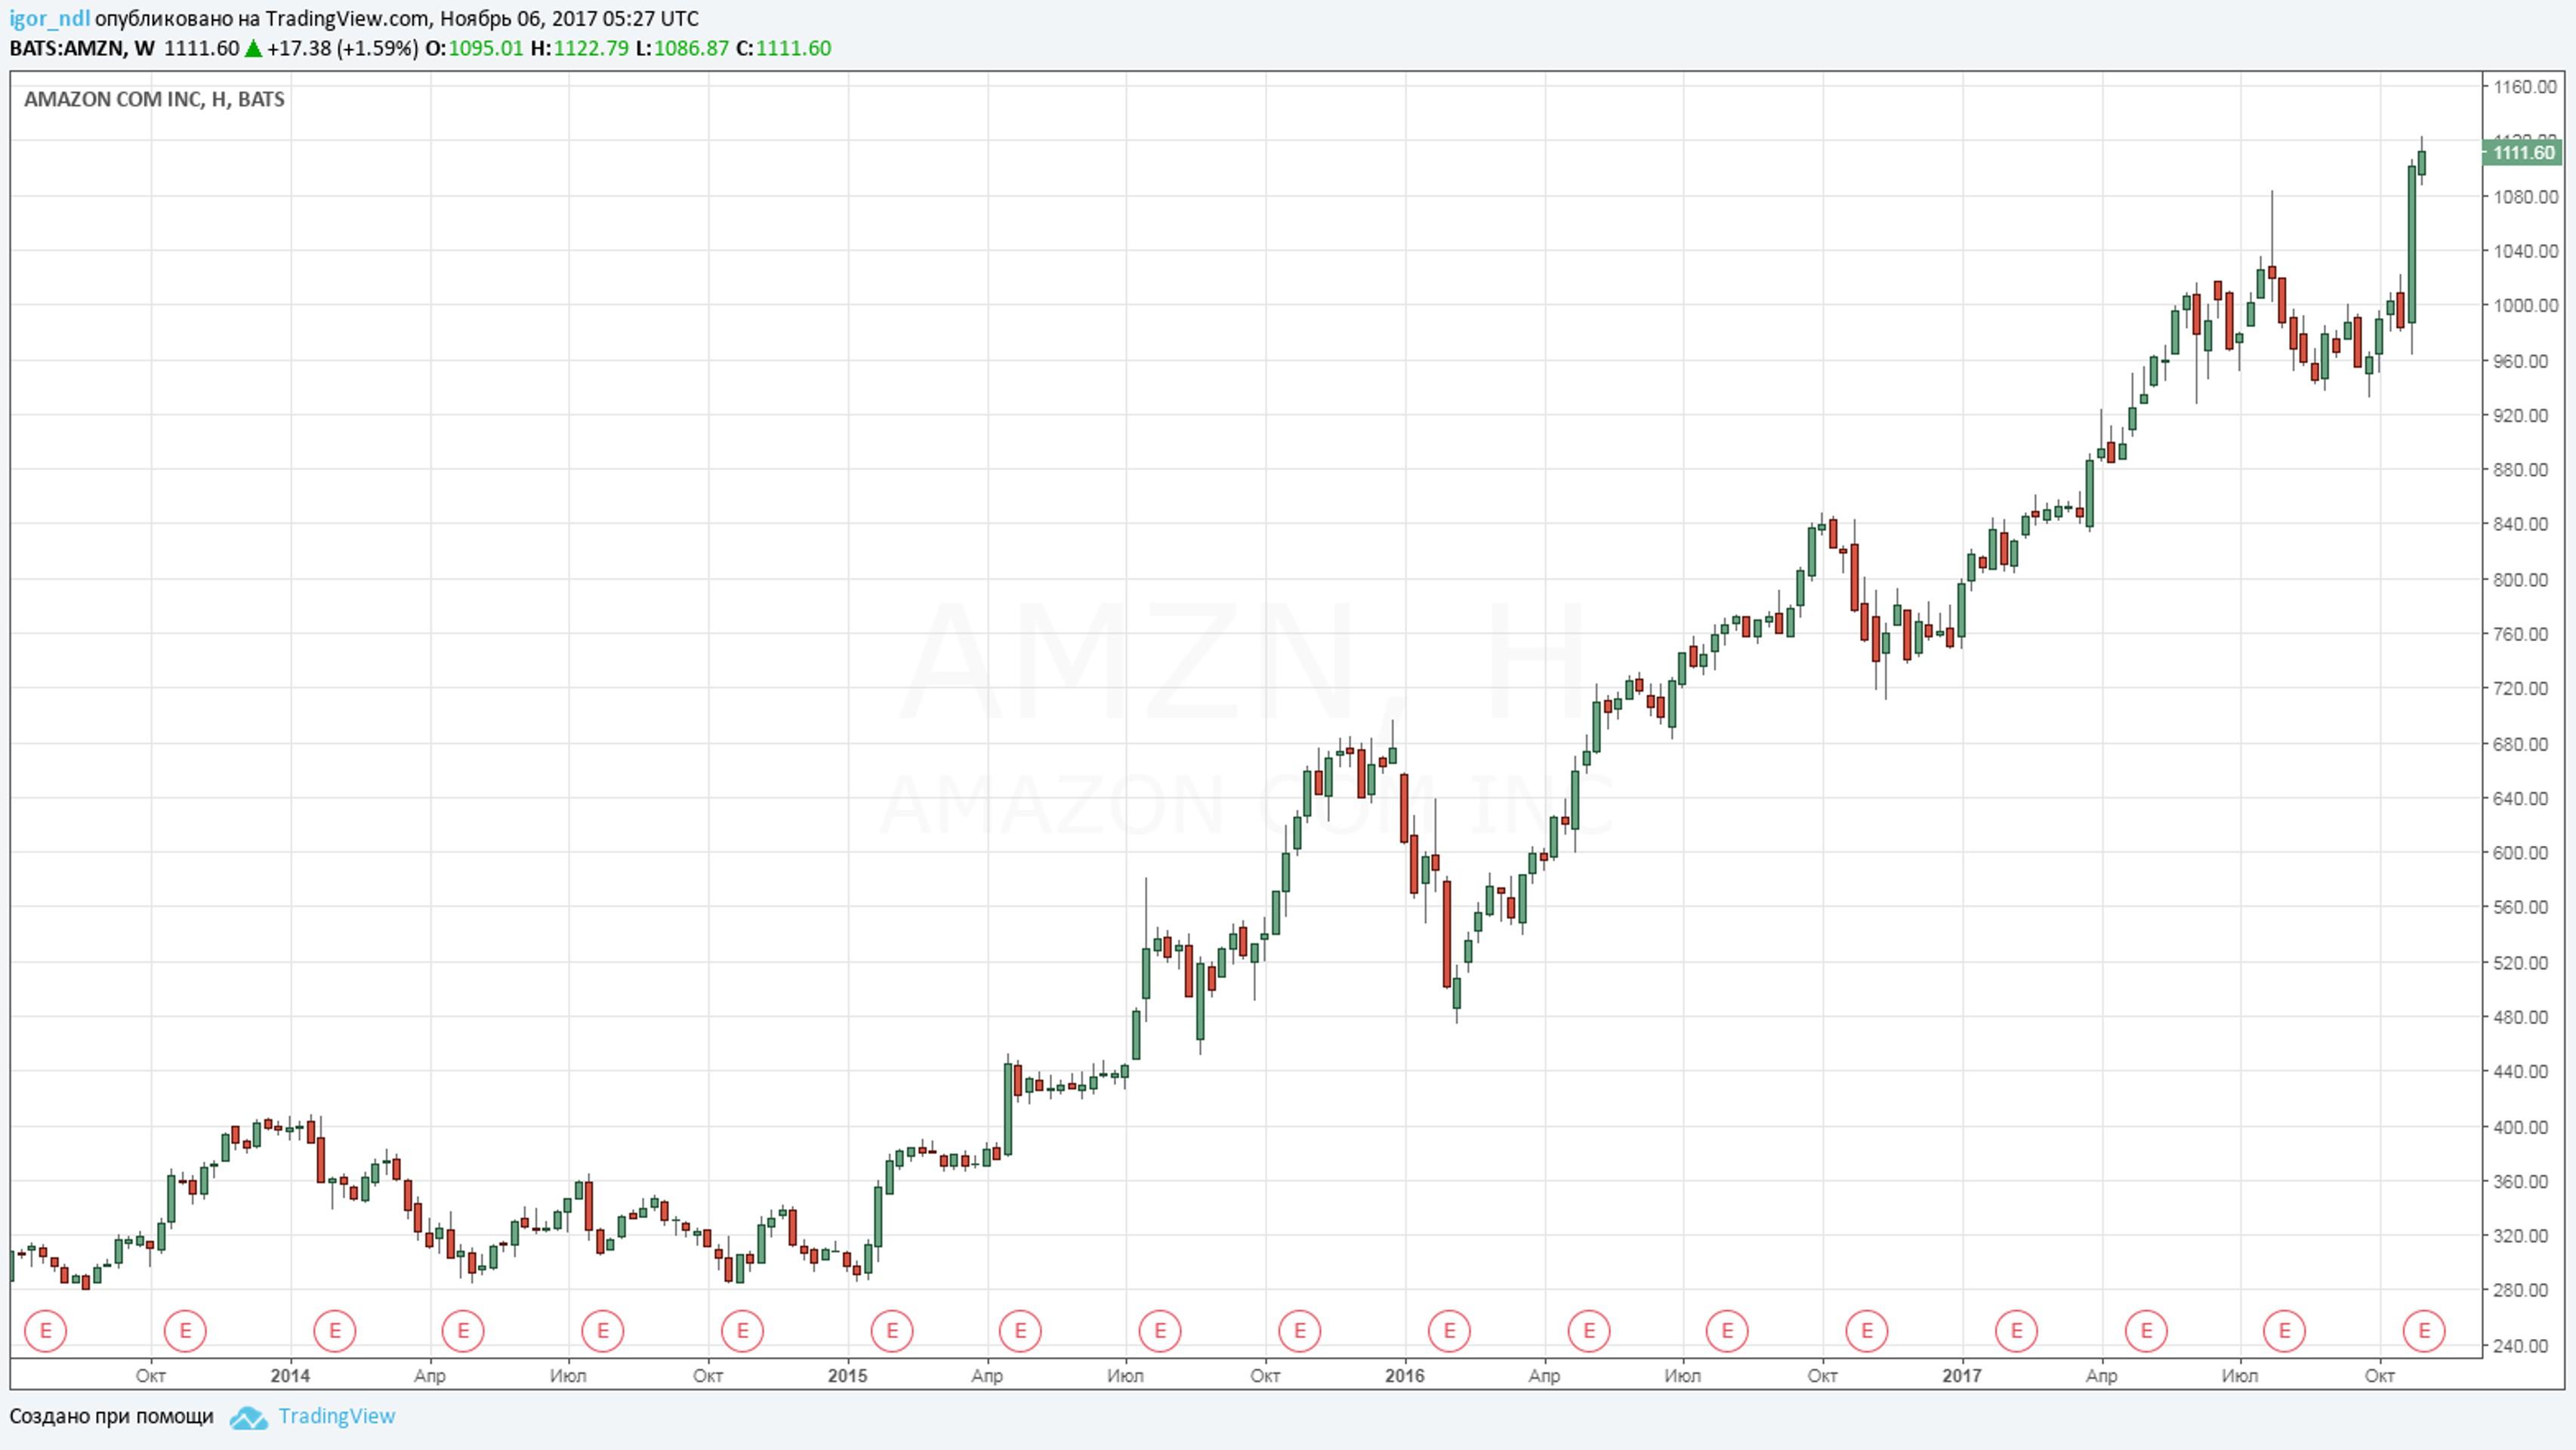 Безос продал еще 1 млн акций Amazon - на максимумах